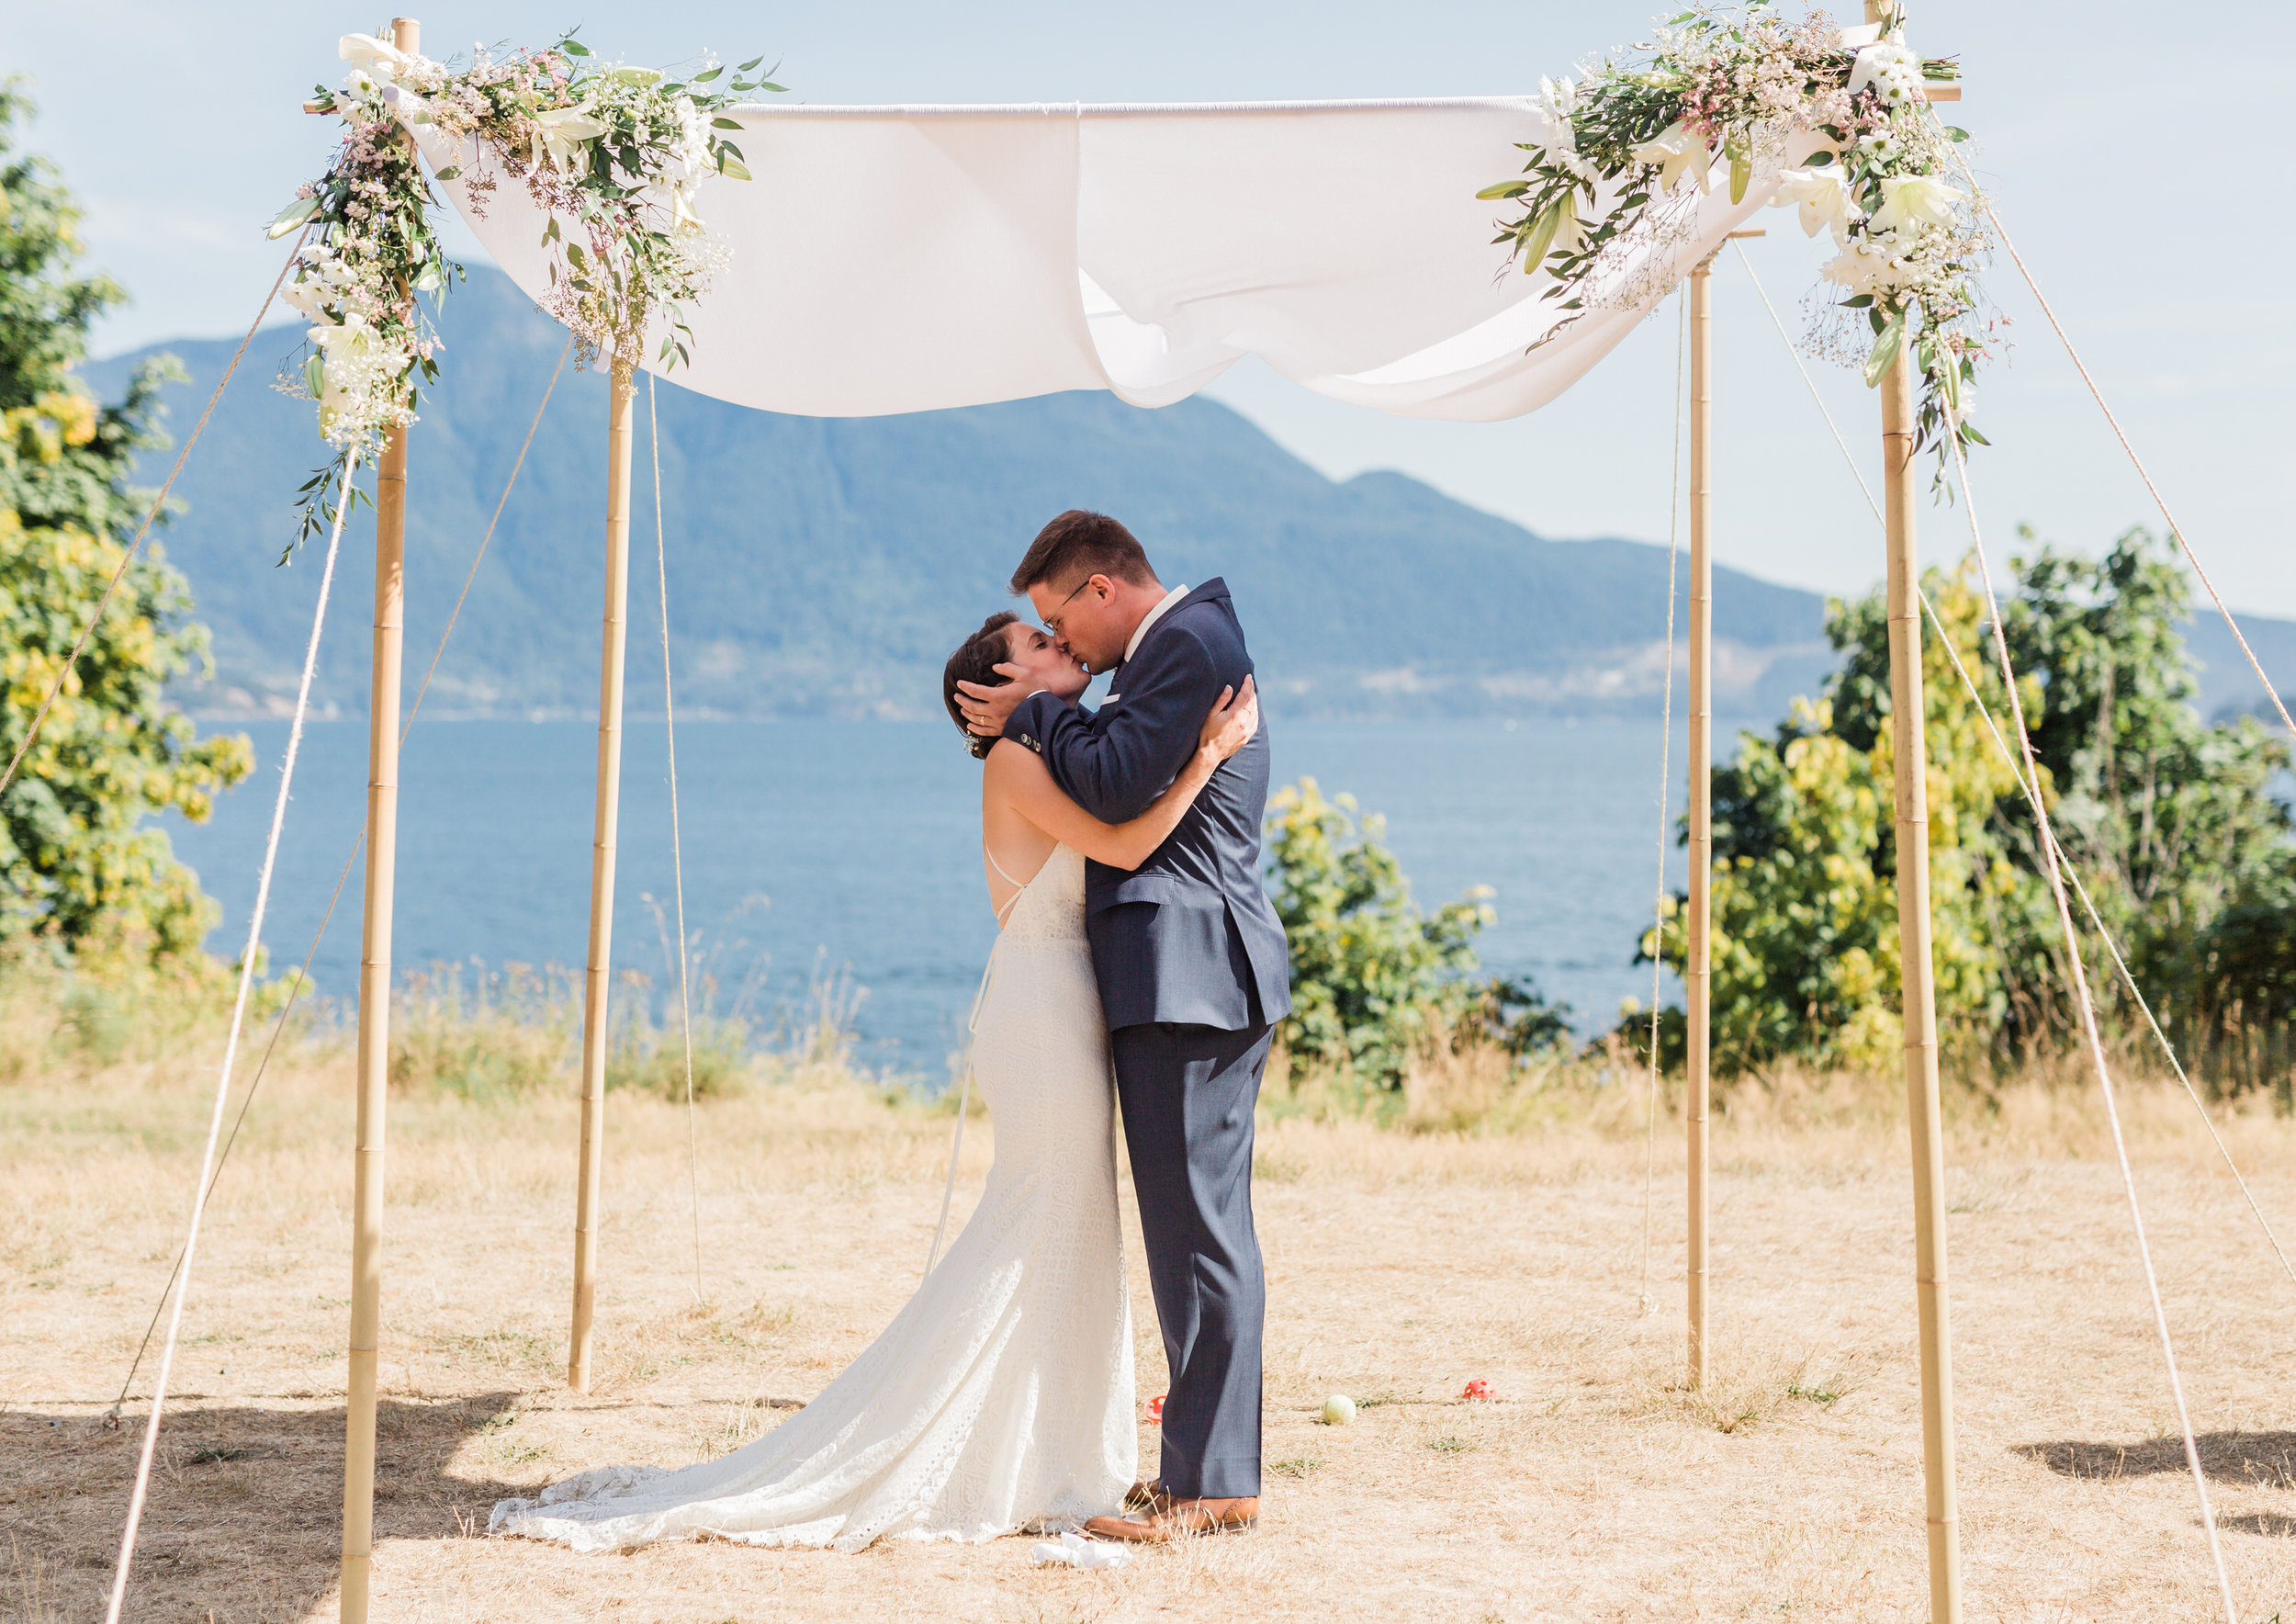 Camp Fircom Wedding - Vancouver Wedding Photographer & Videographer - Sunshine Coast Wedding Photos - Sunshine Coast Wedding Photographer - Jennifer Picard Photography - IMG_0845.jpg